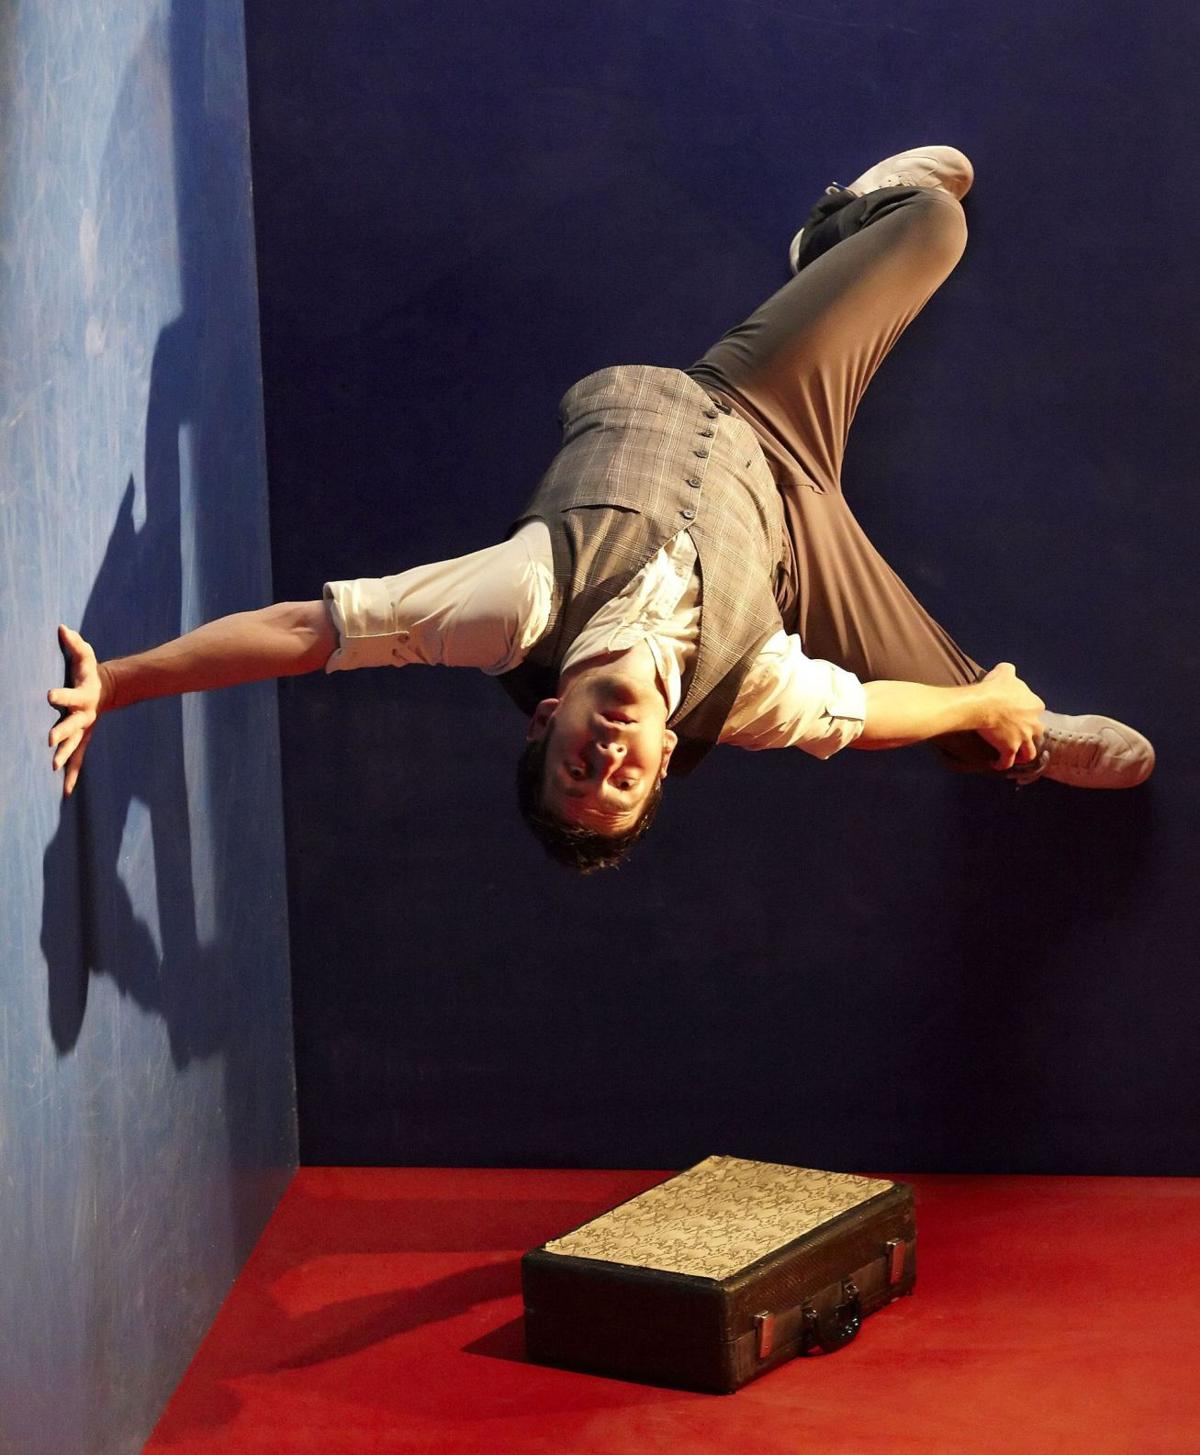 'Leo' a demanding show for former acrobat